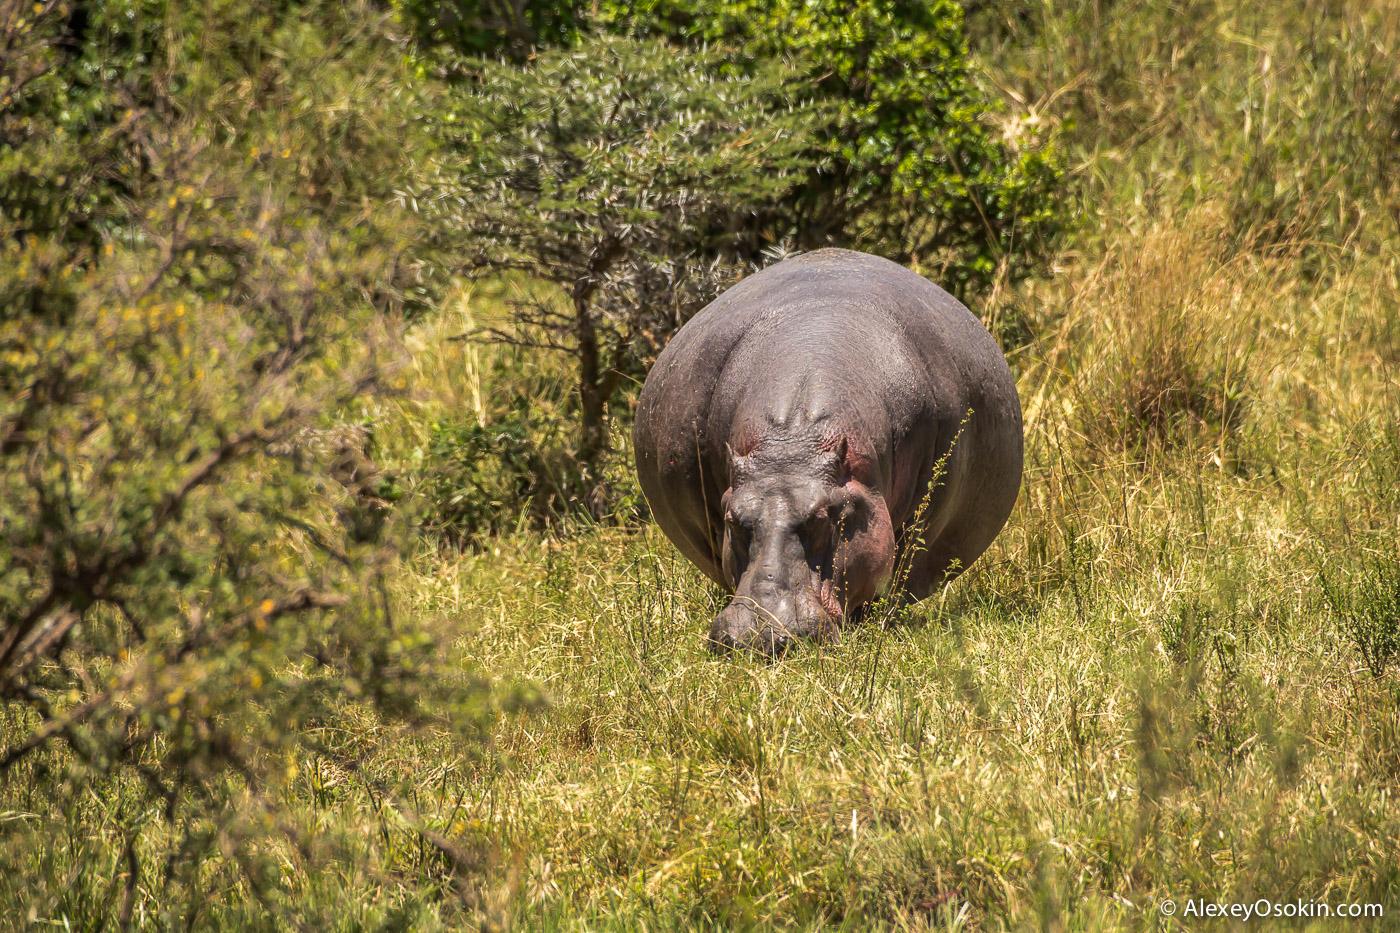 kenya - hippos-ao, aug.2015-18.jpg